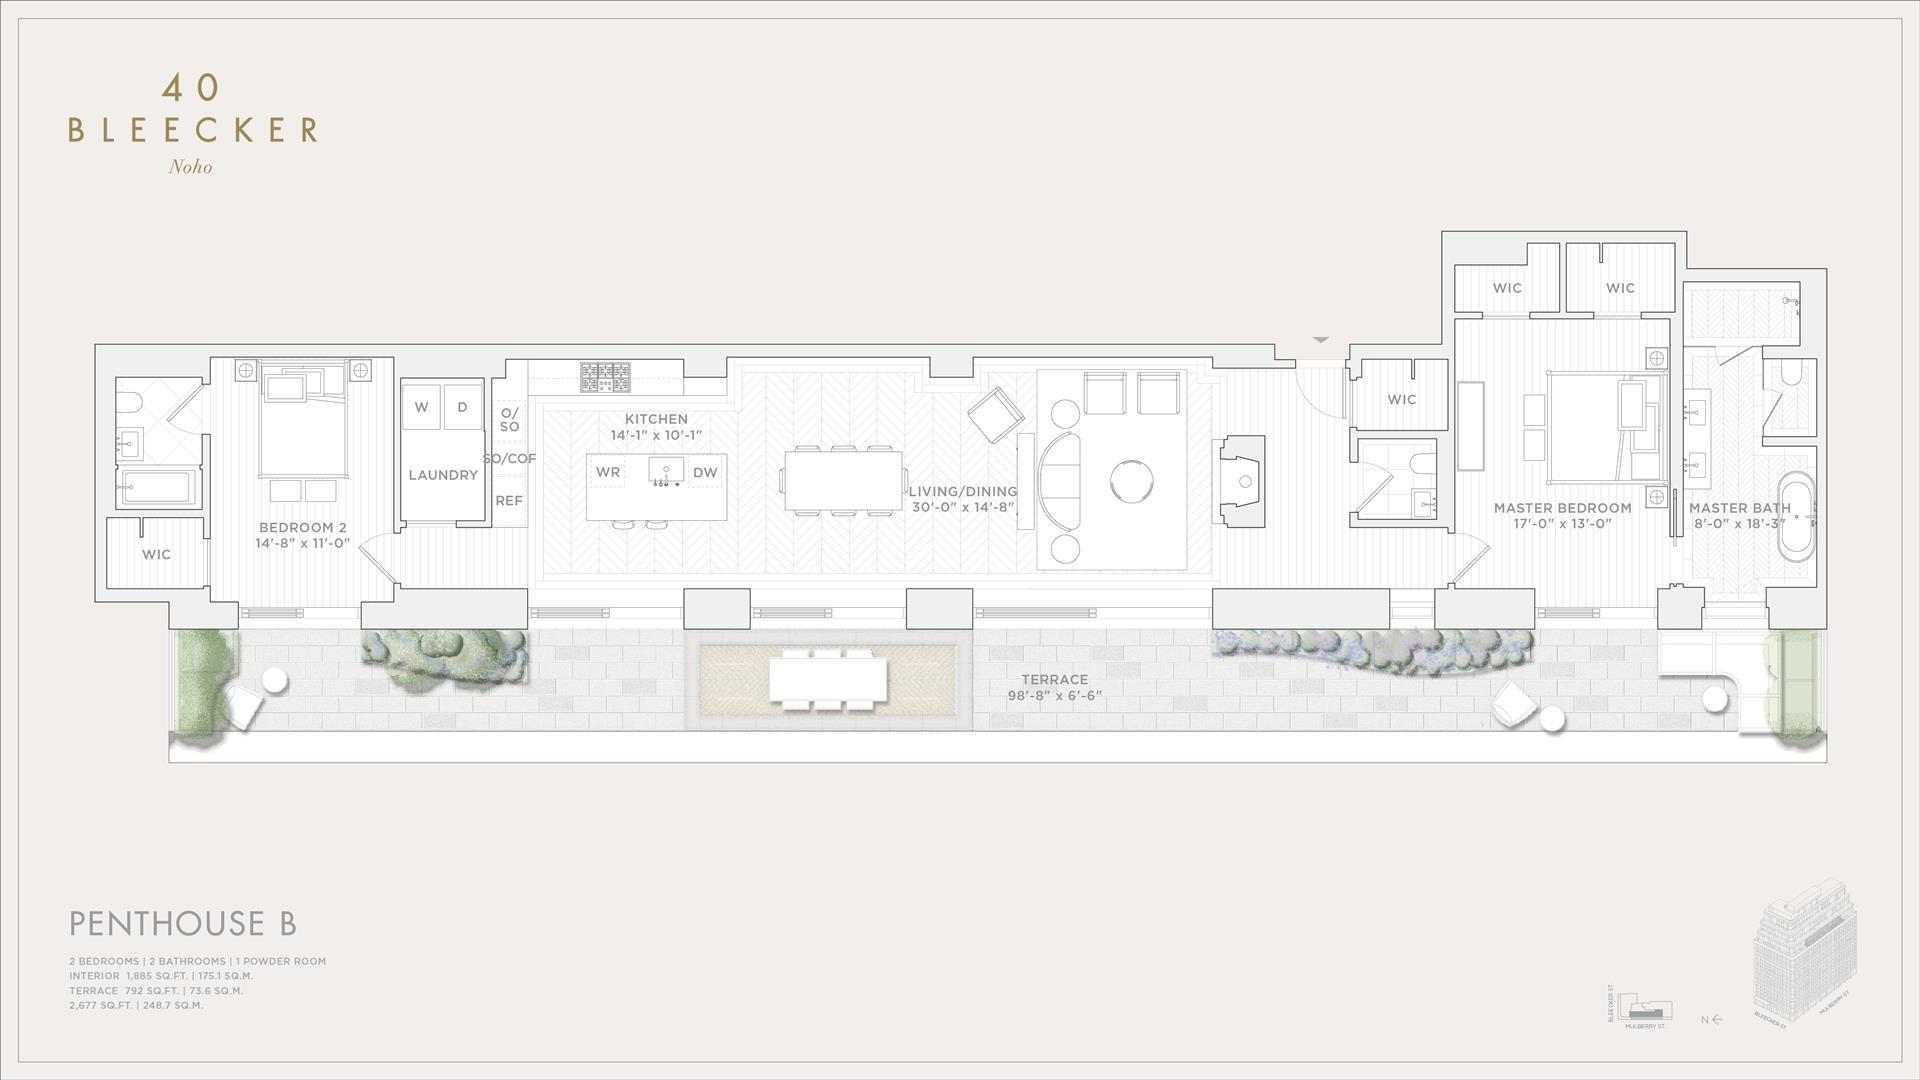 Floor plan of 40 Bleecker Street, PHB - NoHo, New York